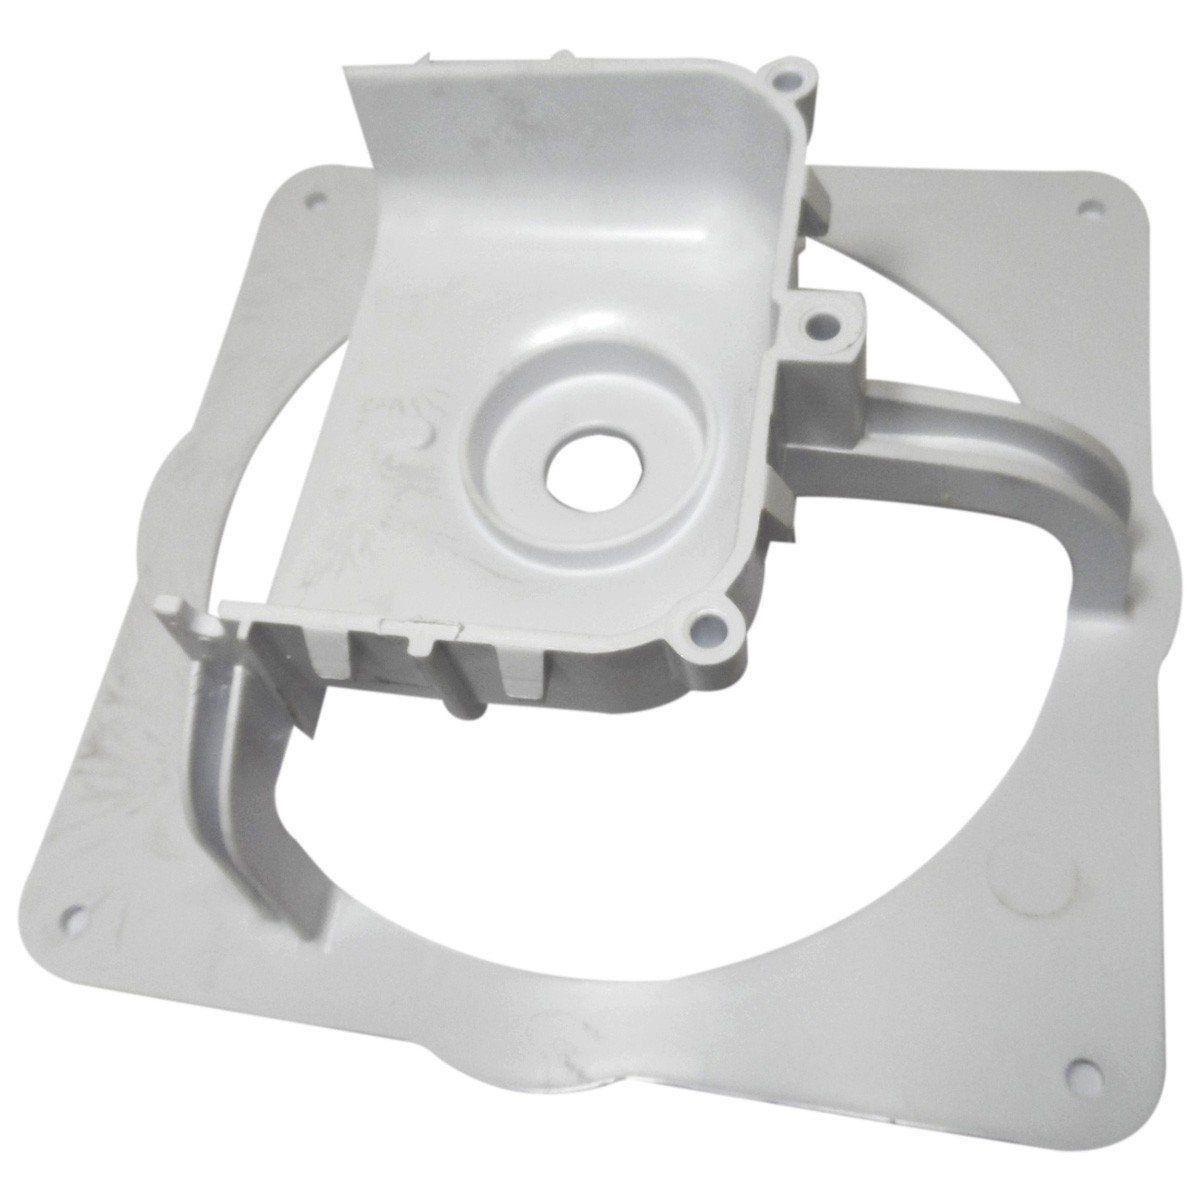 Suporte Motor Ventilador Refrigerador Brastemp Consul 326031204